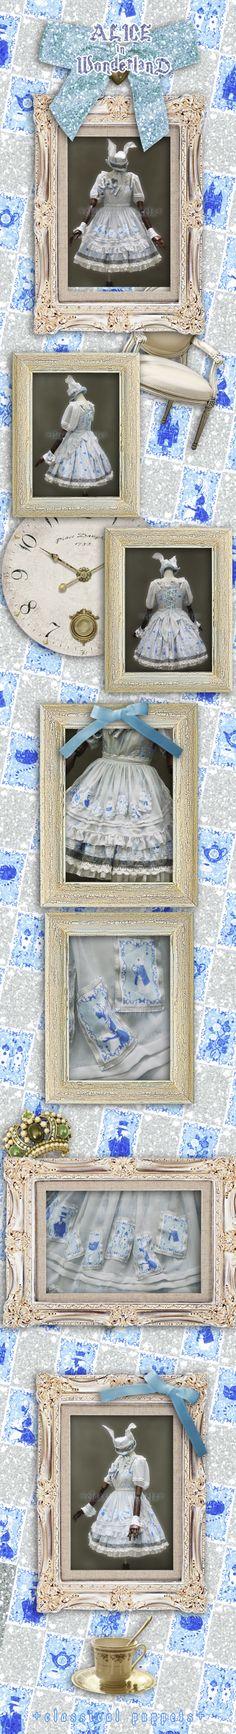 ◆ ◆ doll adventure classic Alice - chiffon aprons Poker Accessories - Taobao -- $24 pics are confusing JUST the APRON :) #classicalpuppets #taobao  #lolita #lolitafashion #jfashion